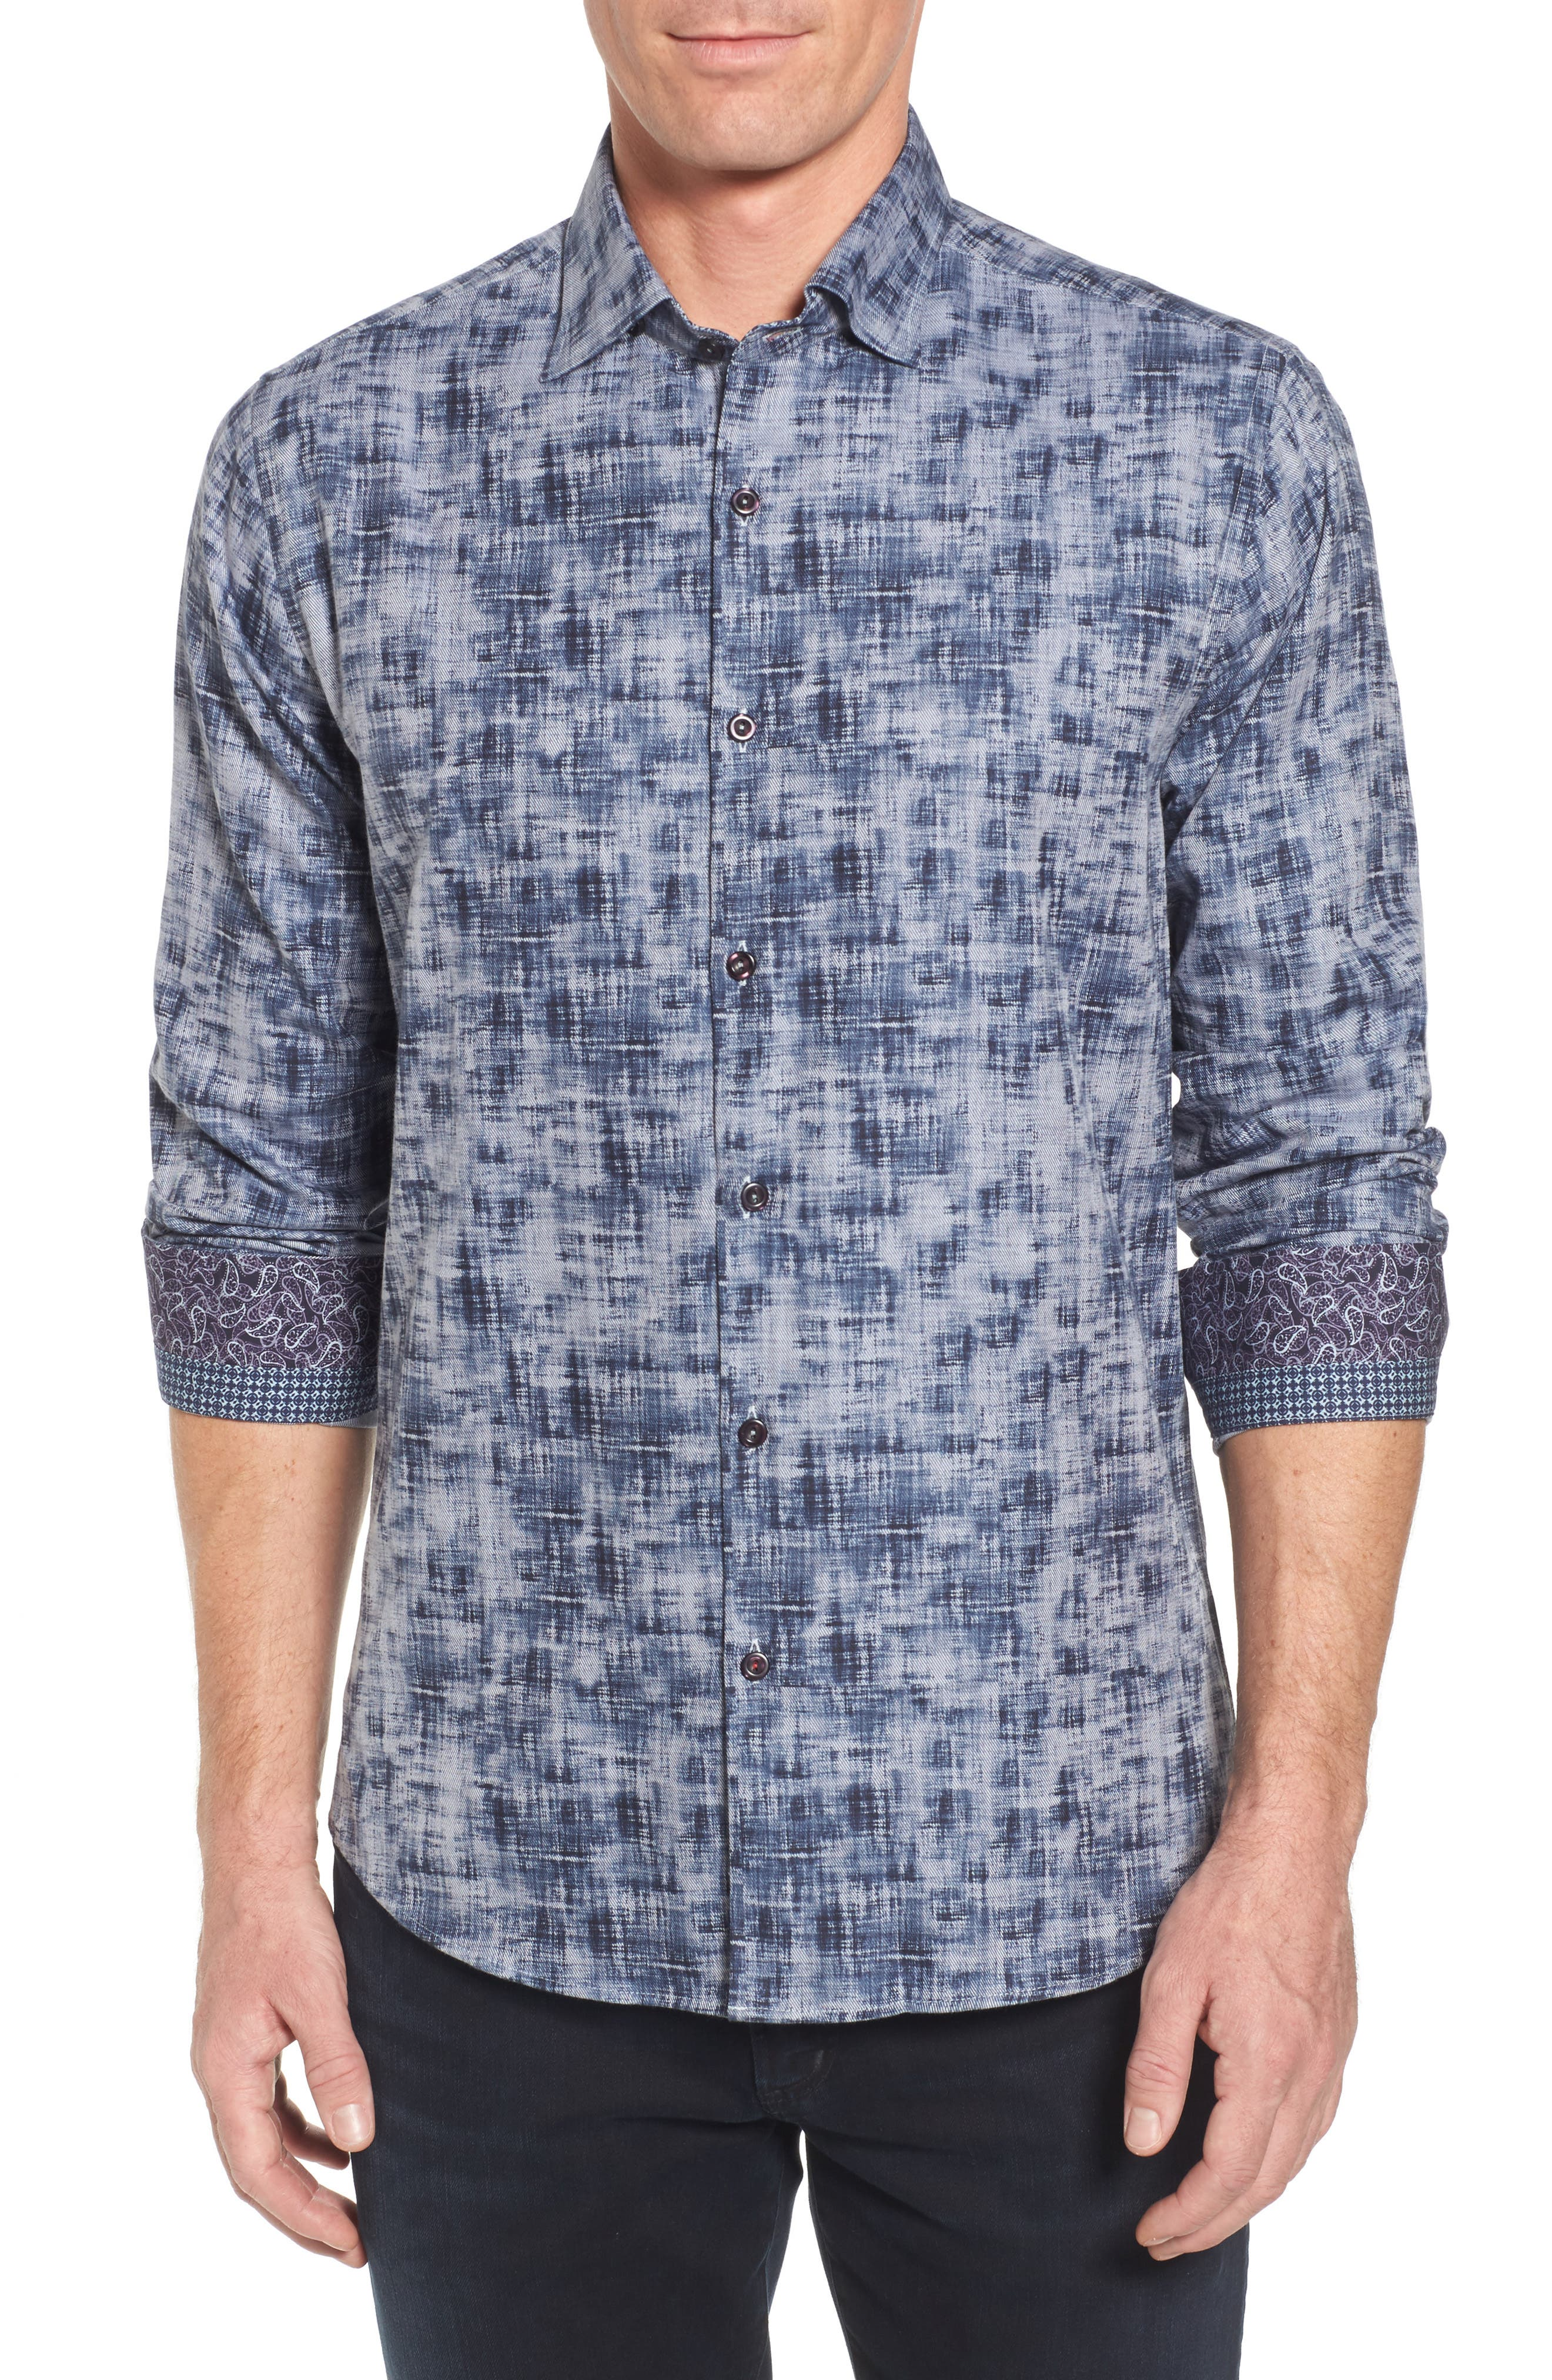 Main Image - Stone Rose Slim Fit Twill FX Print Sport Shirt